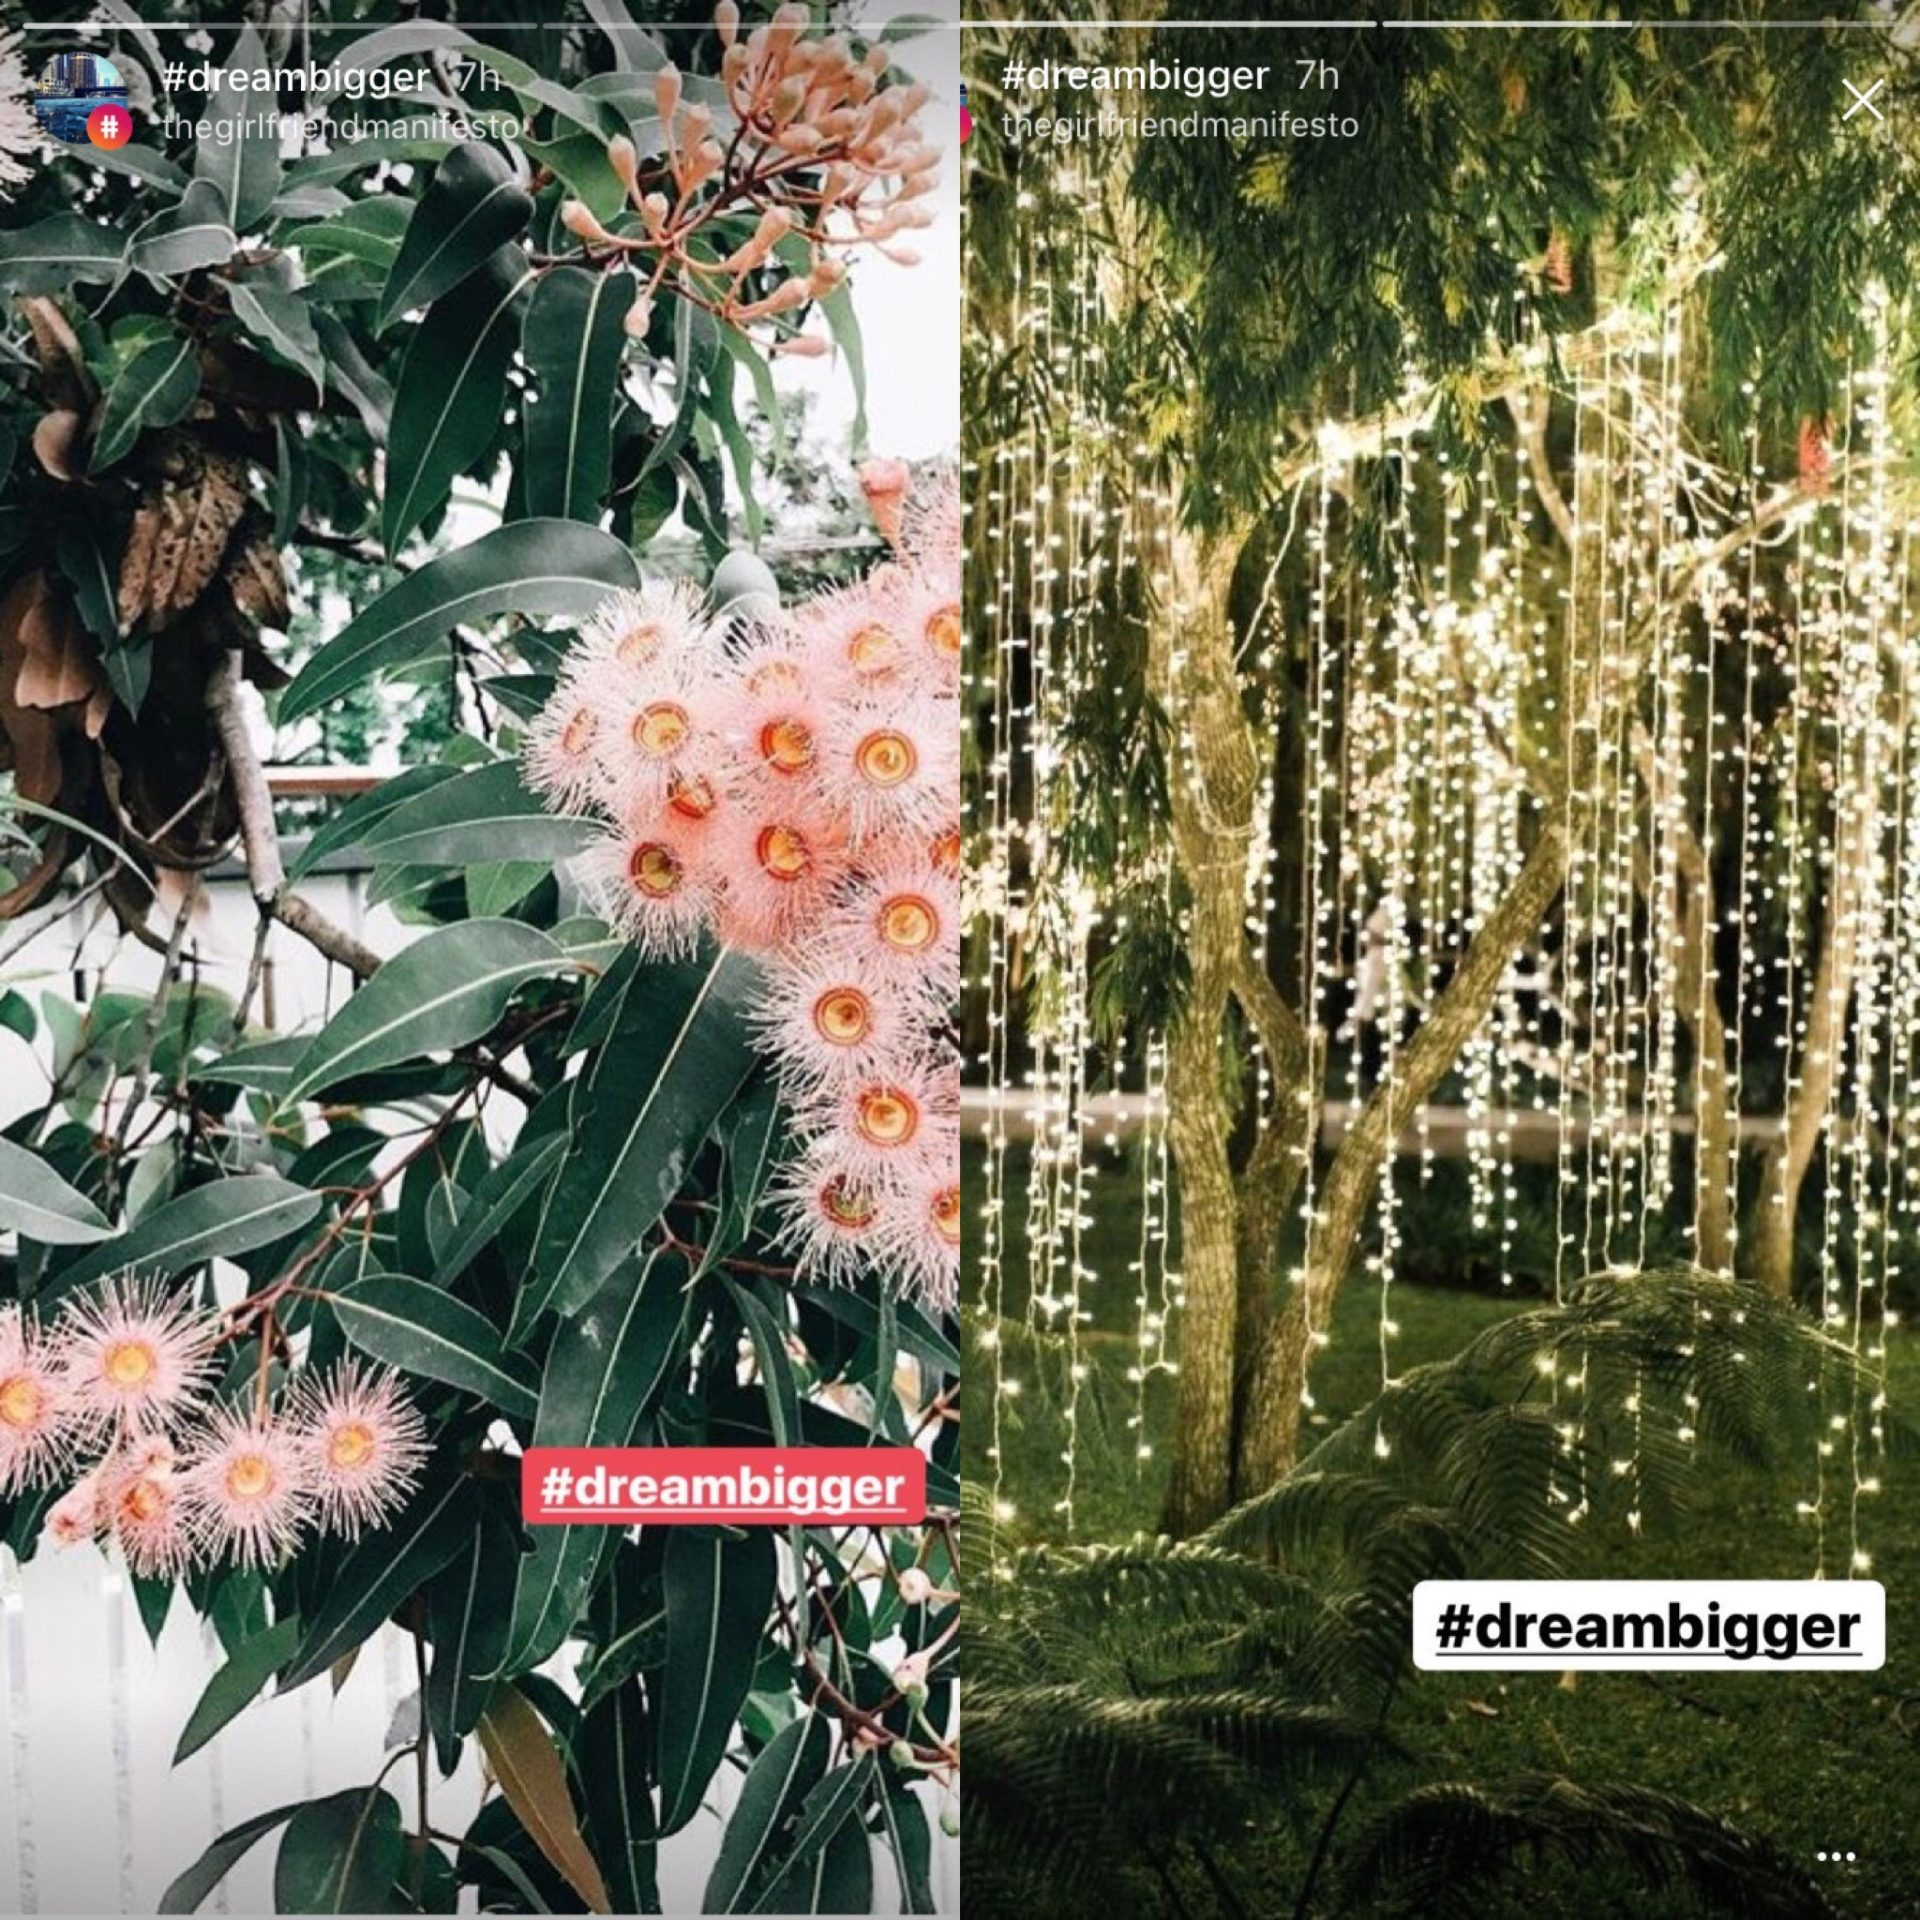 Strategic hashtagging in Instagram Stories